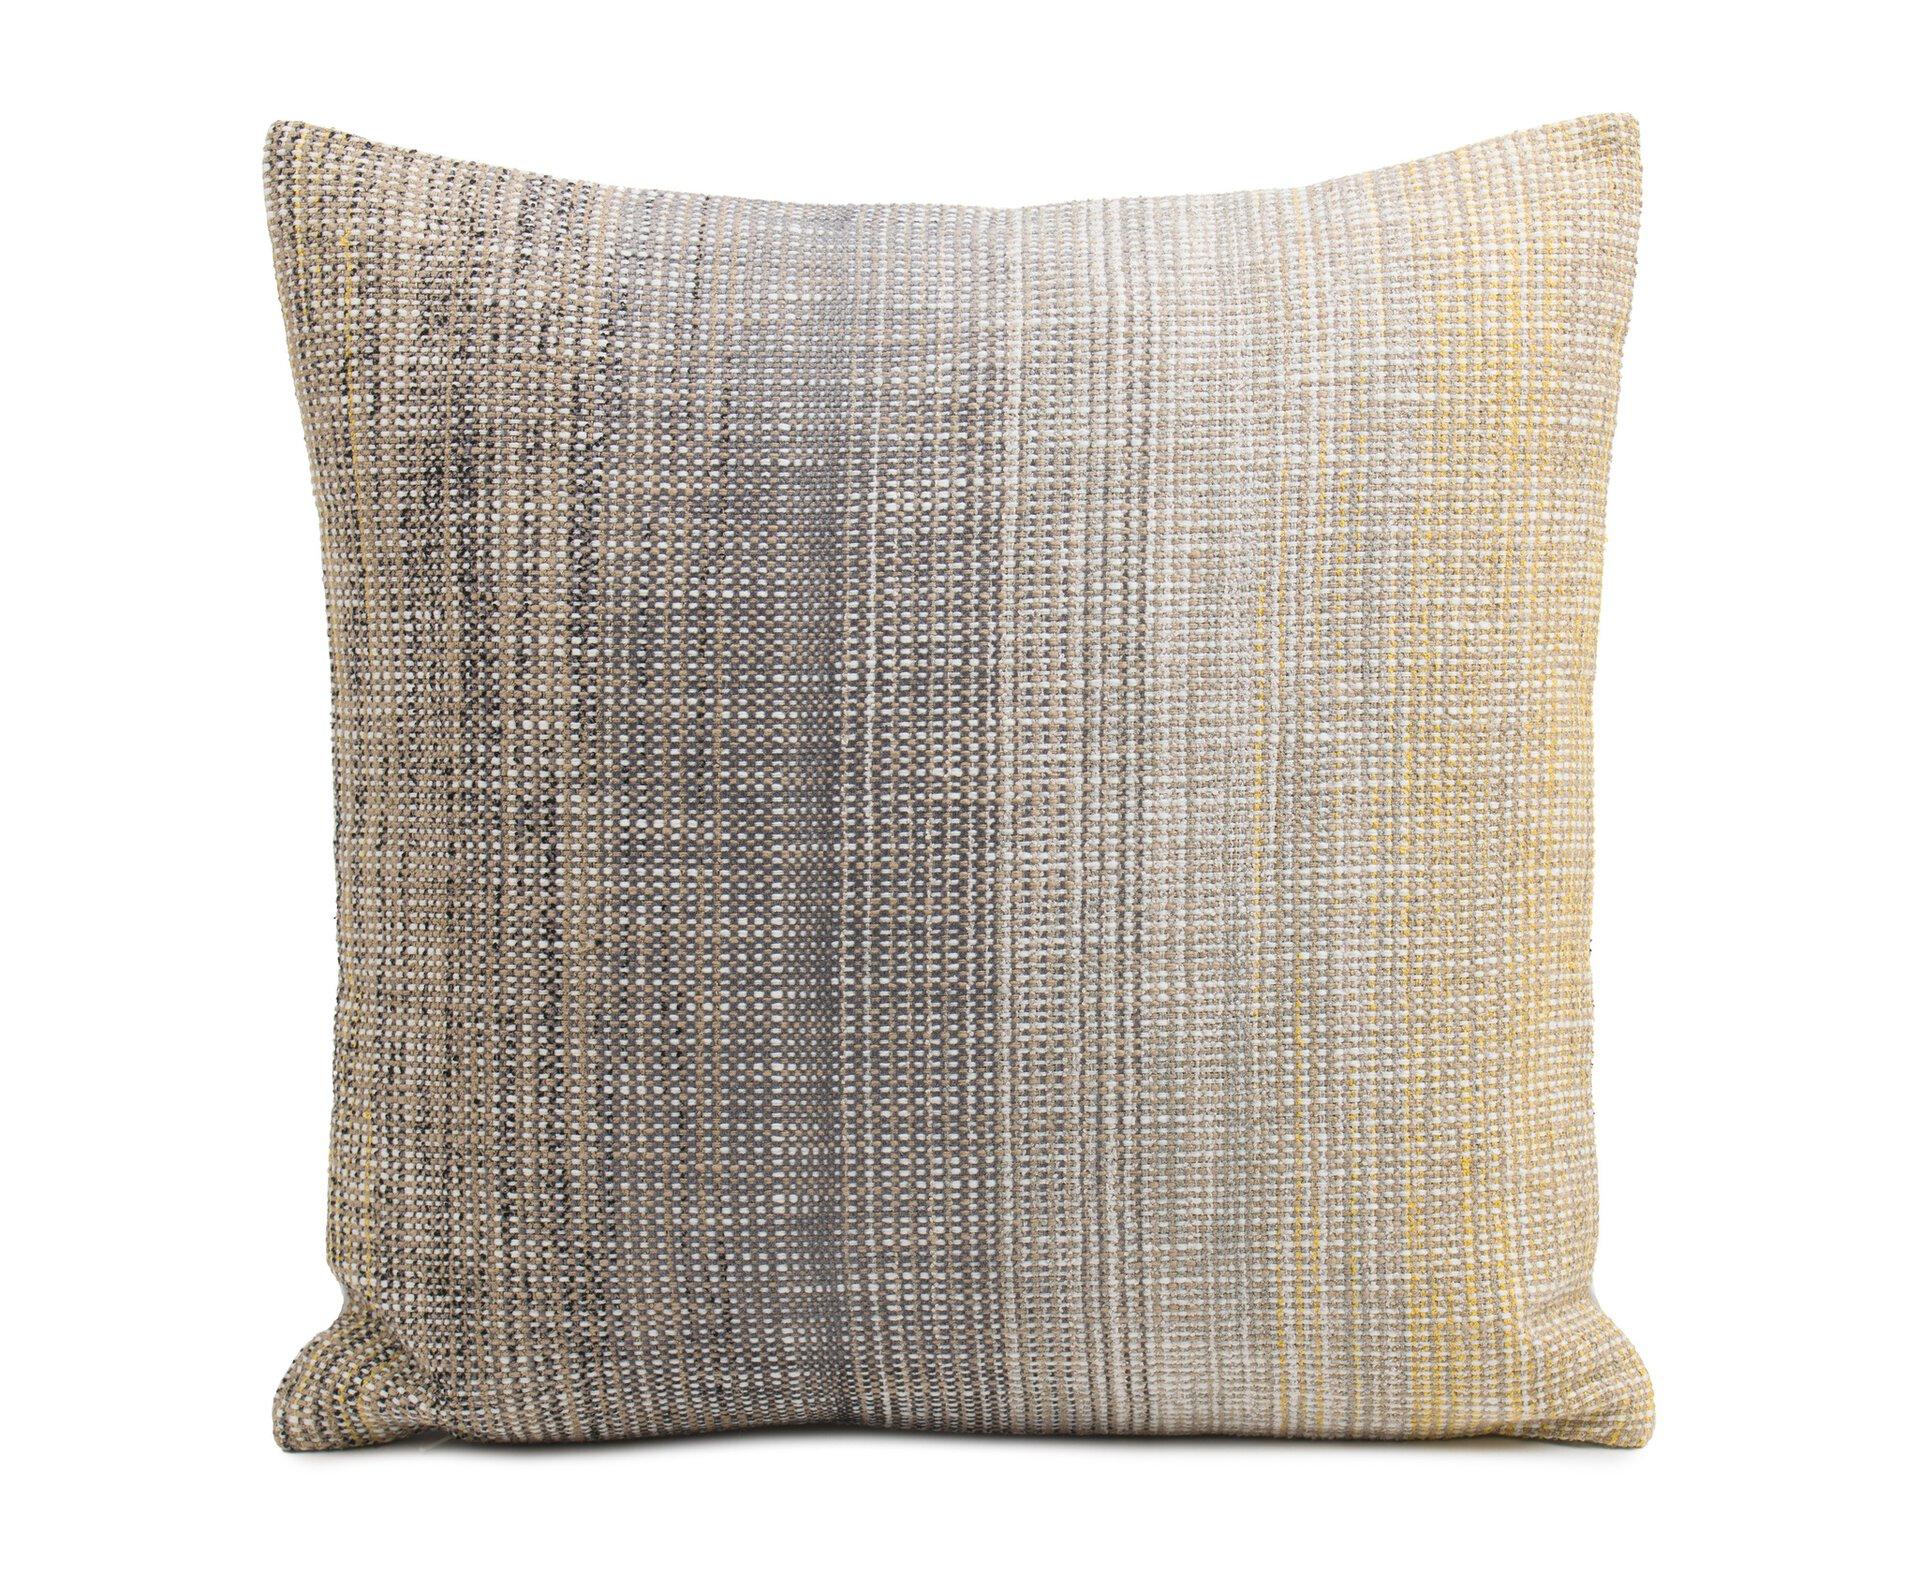 Kissenhülle Minora Ambiente Trendlife Textil gelb 50 x 50 cm